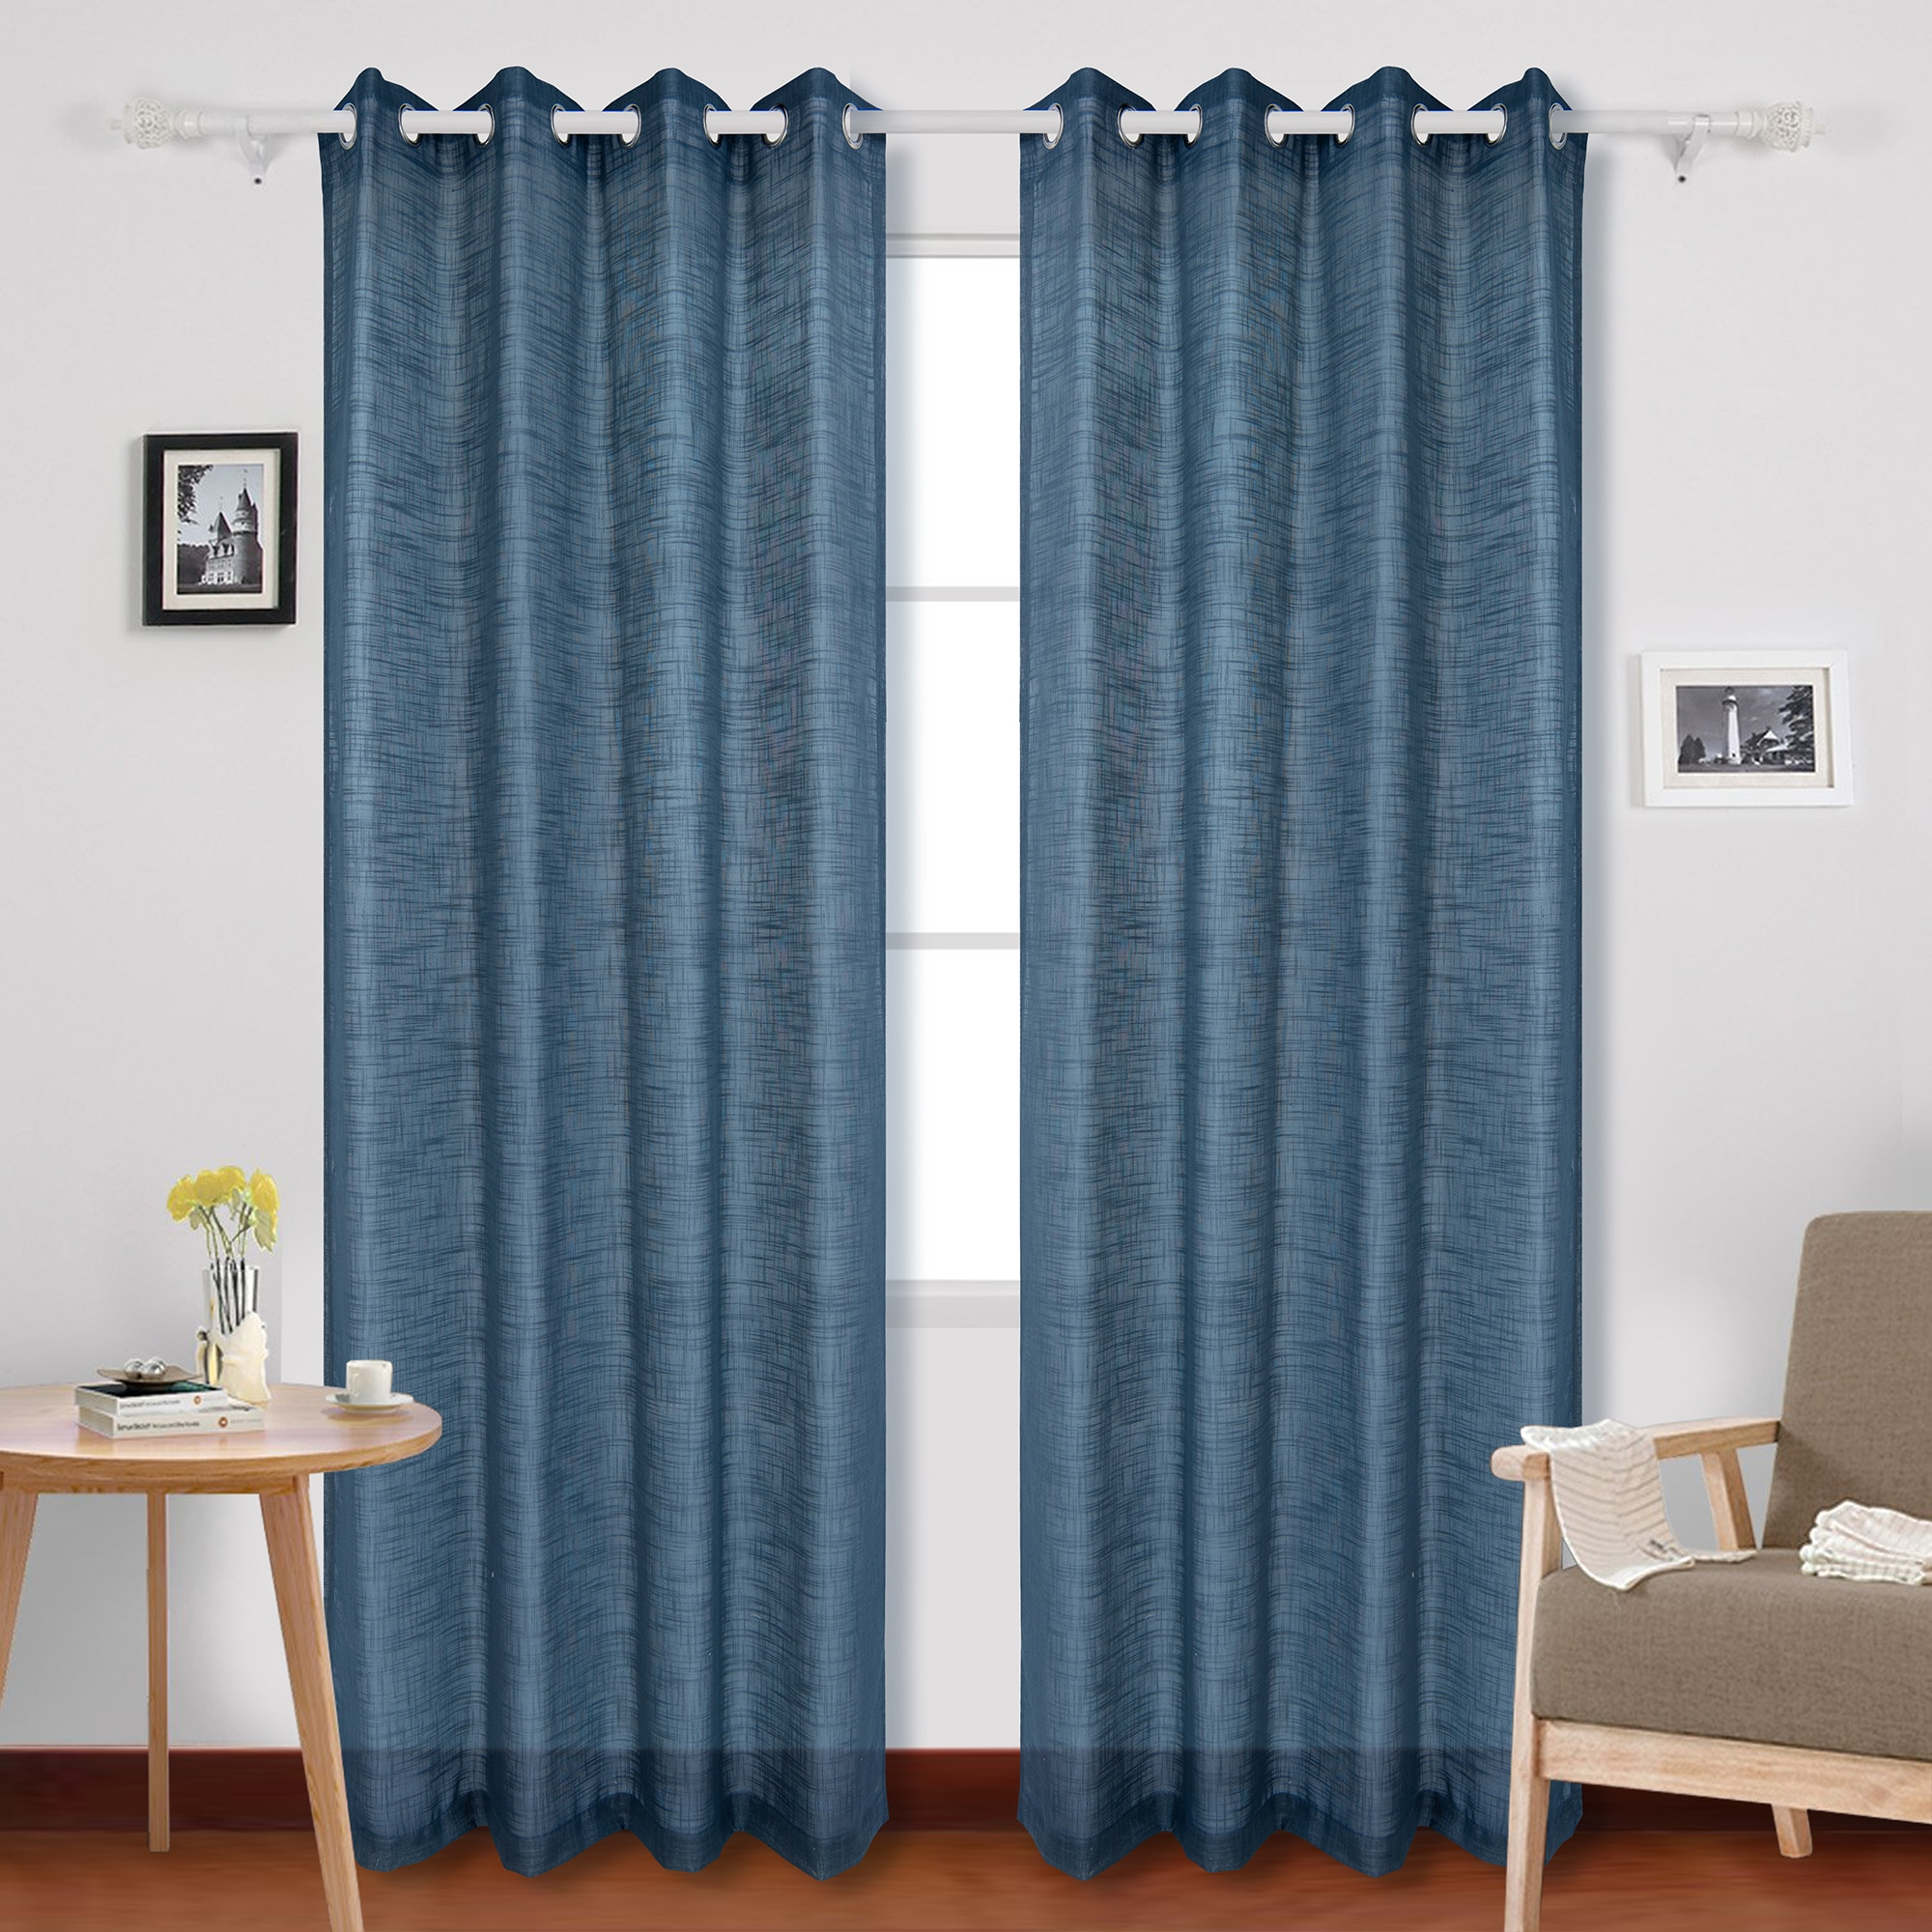 Fotografie Set perdele Kring, 2 * 140x245 cm, Poliester, Albastru inchis